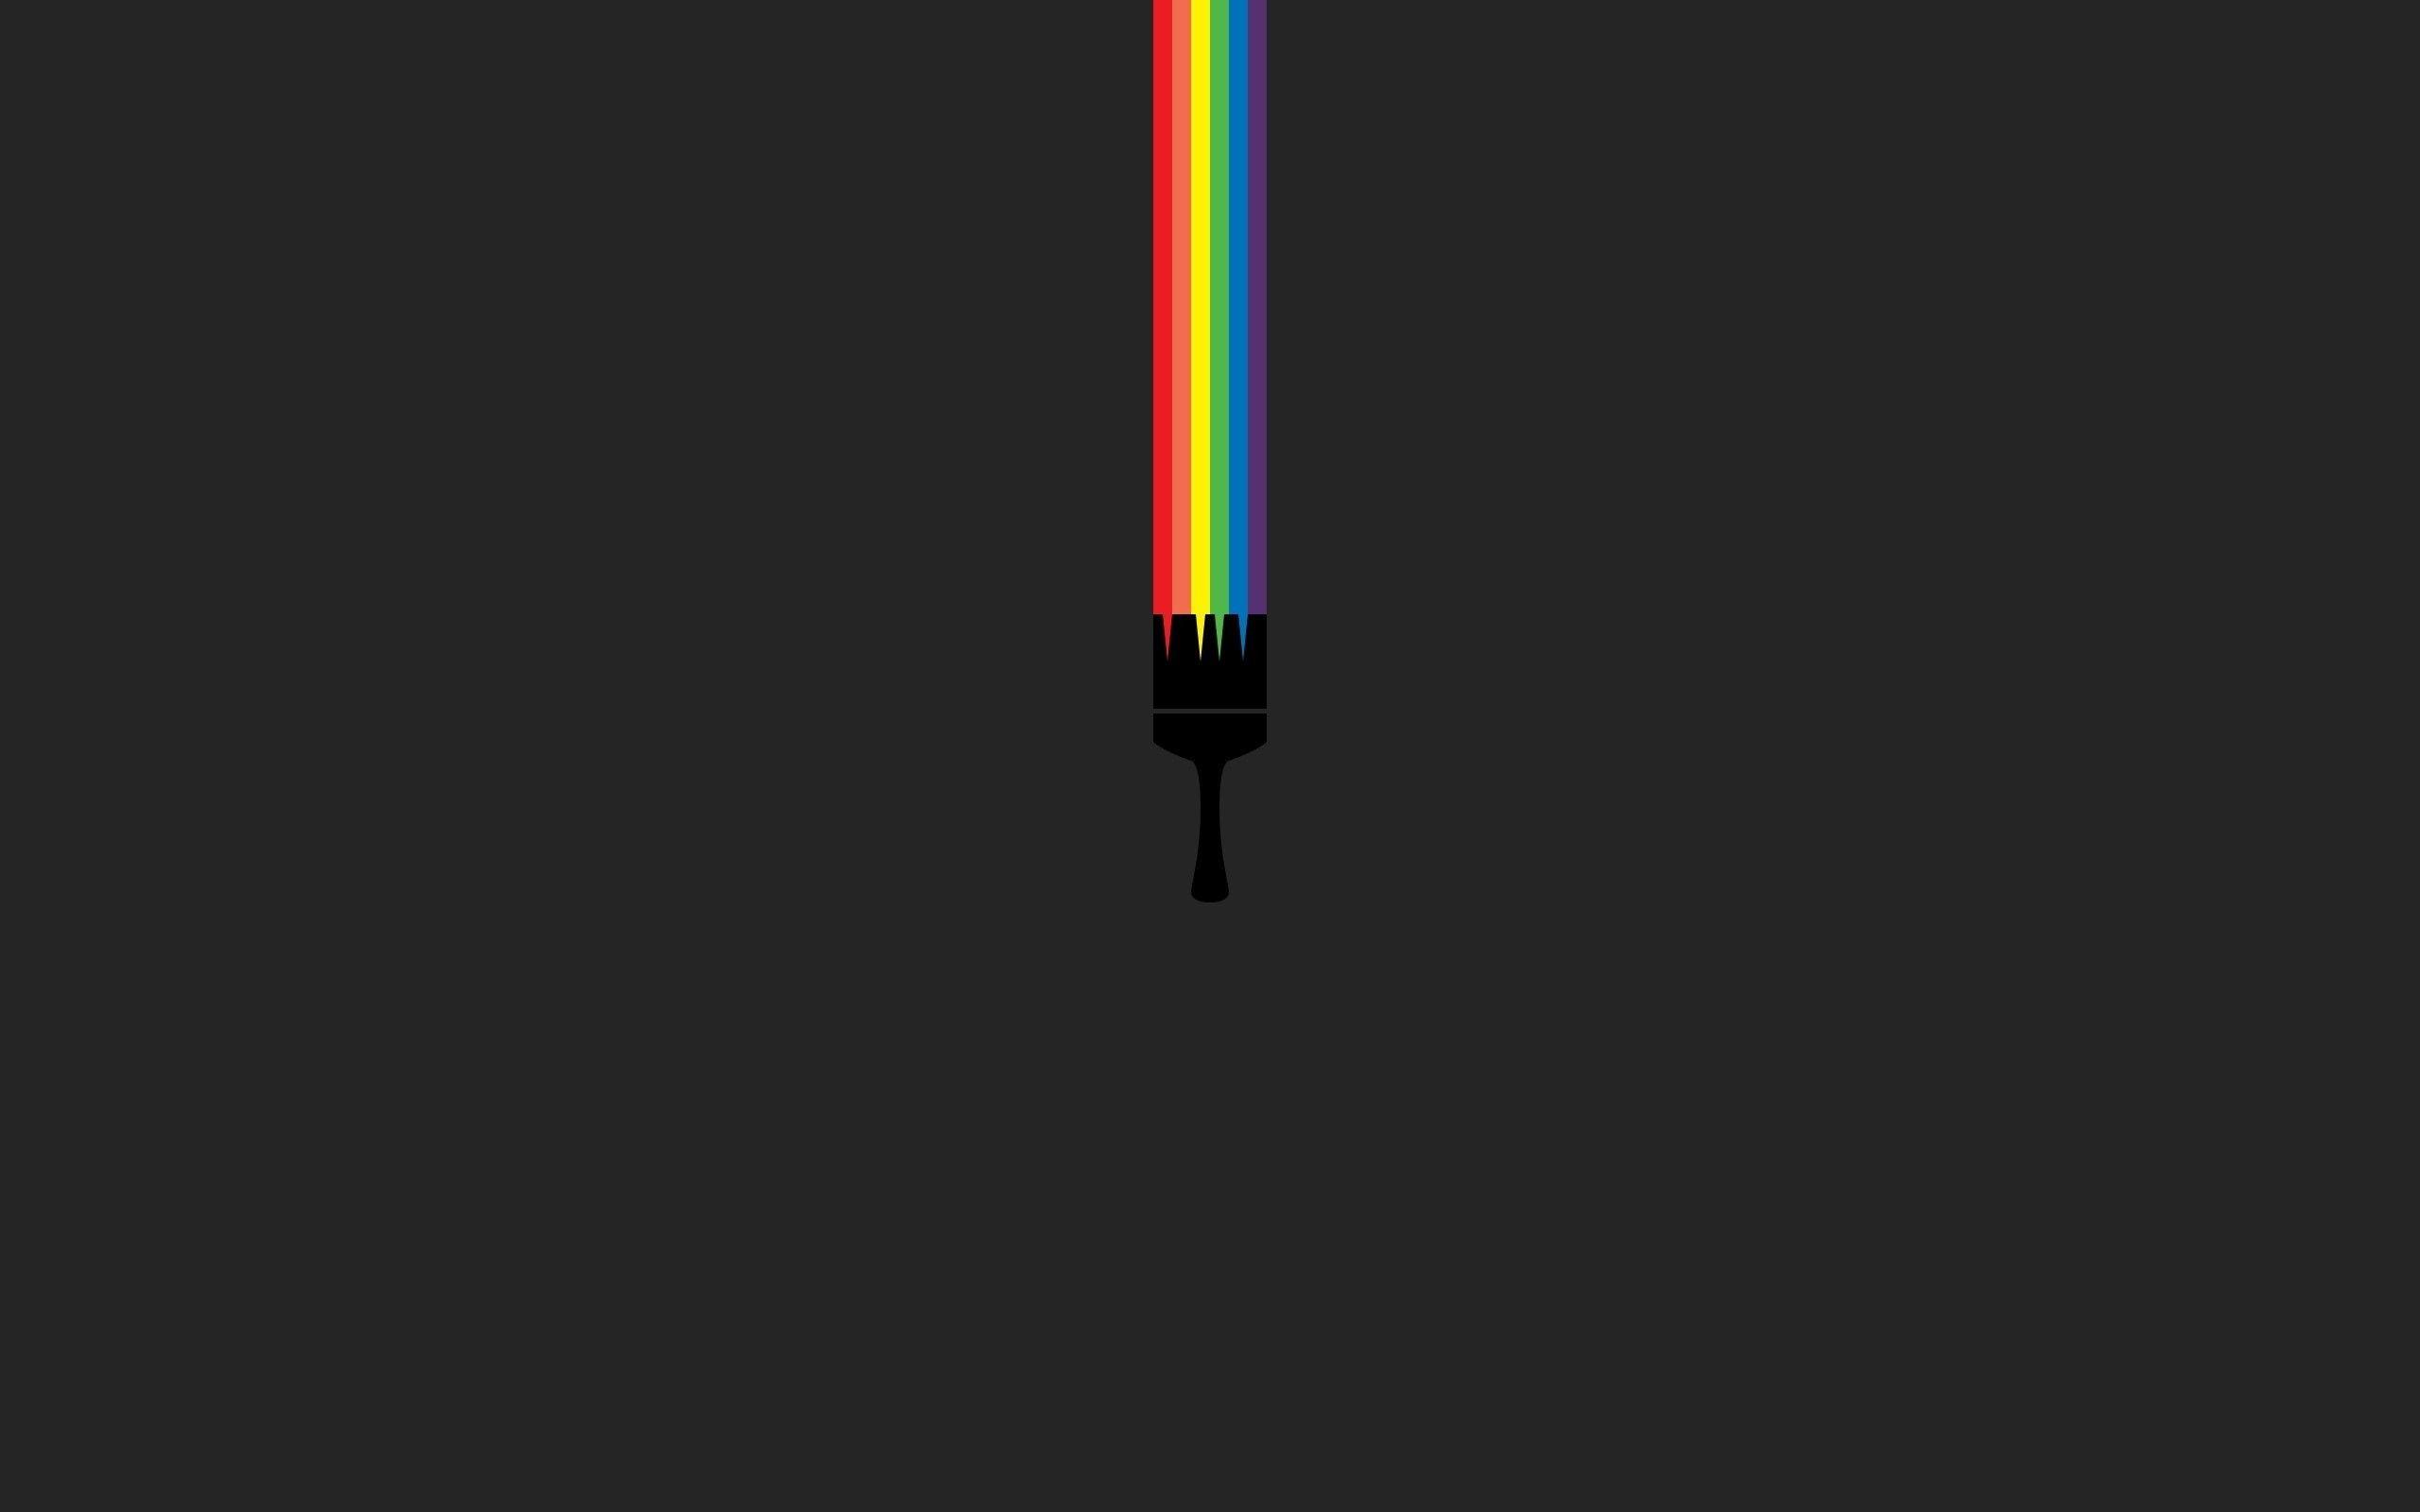 Rainbow Hd Wallpapers Page 0 High Resolution Wallarthd Com Com